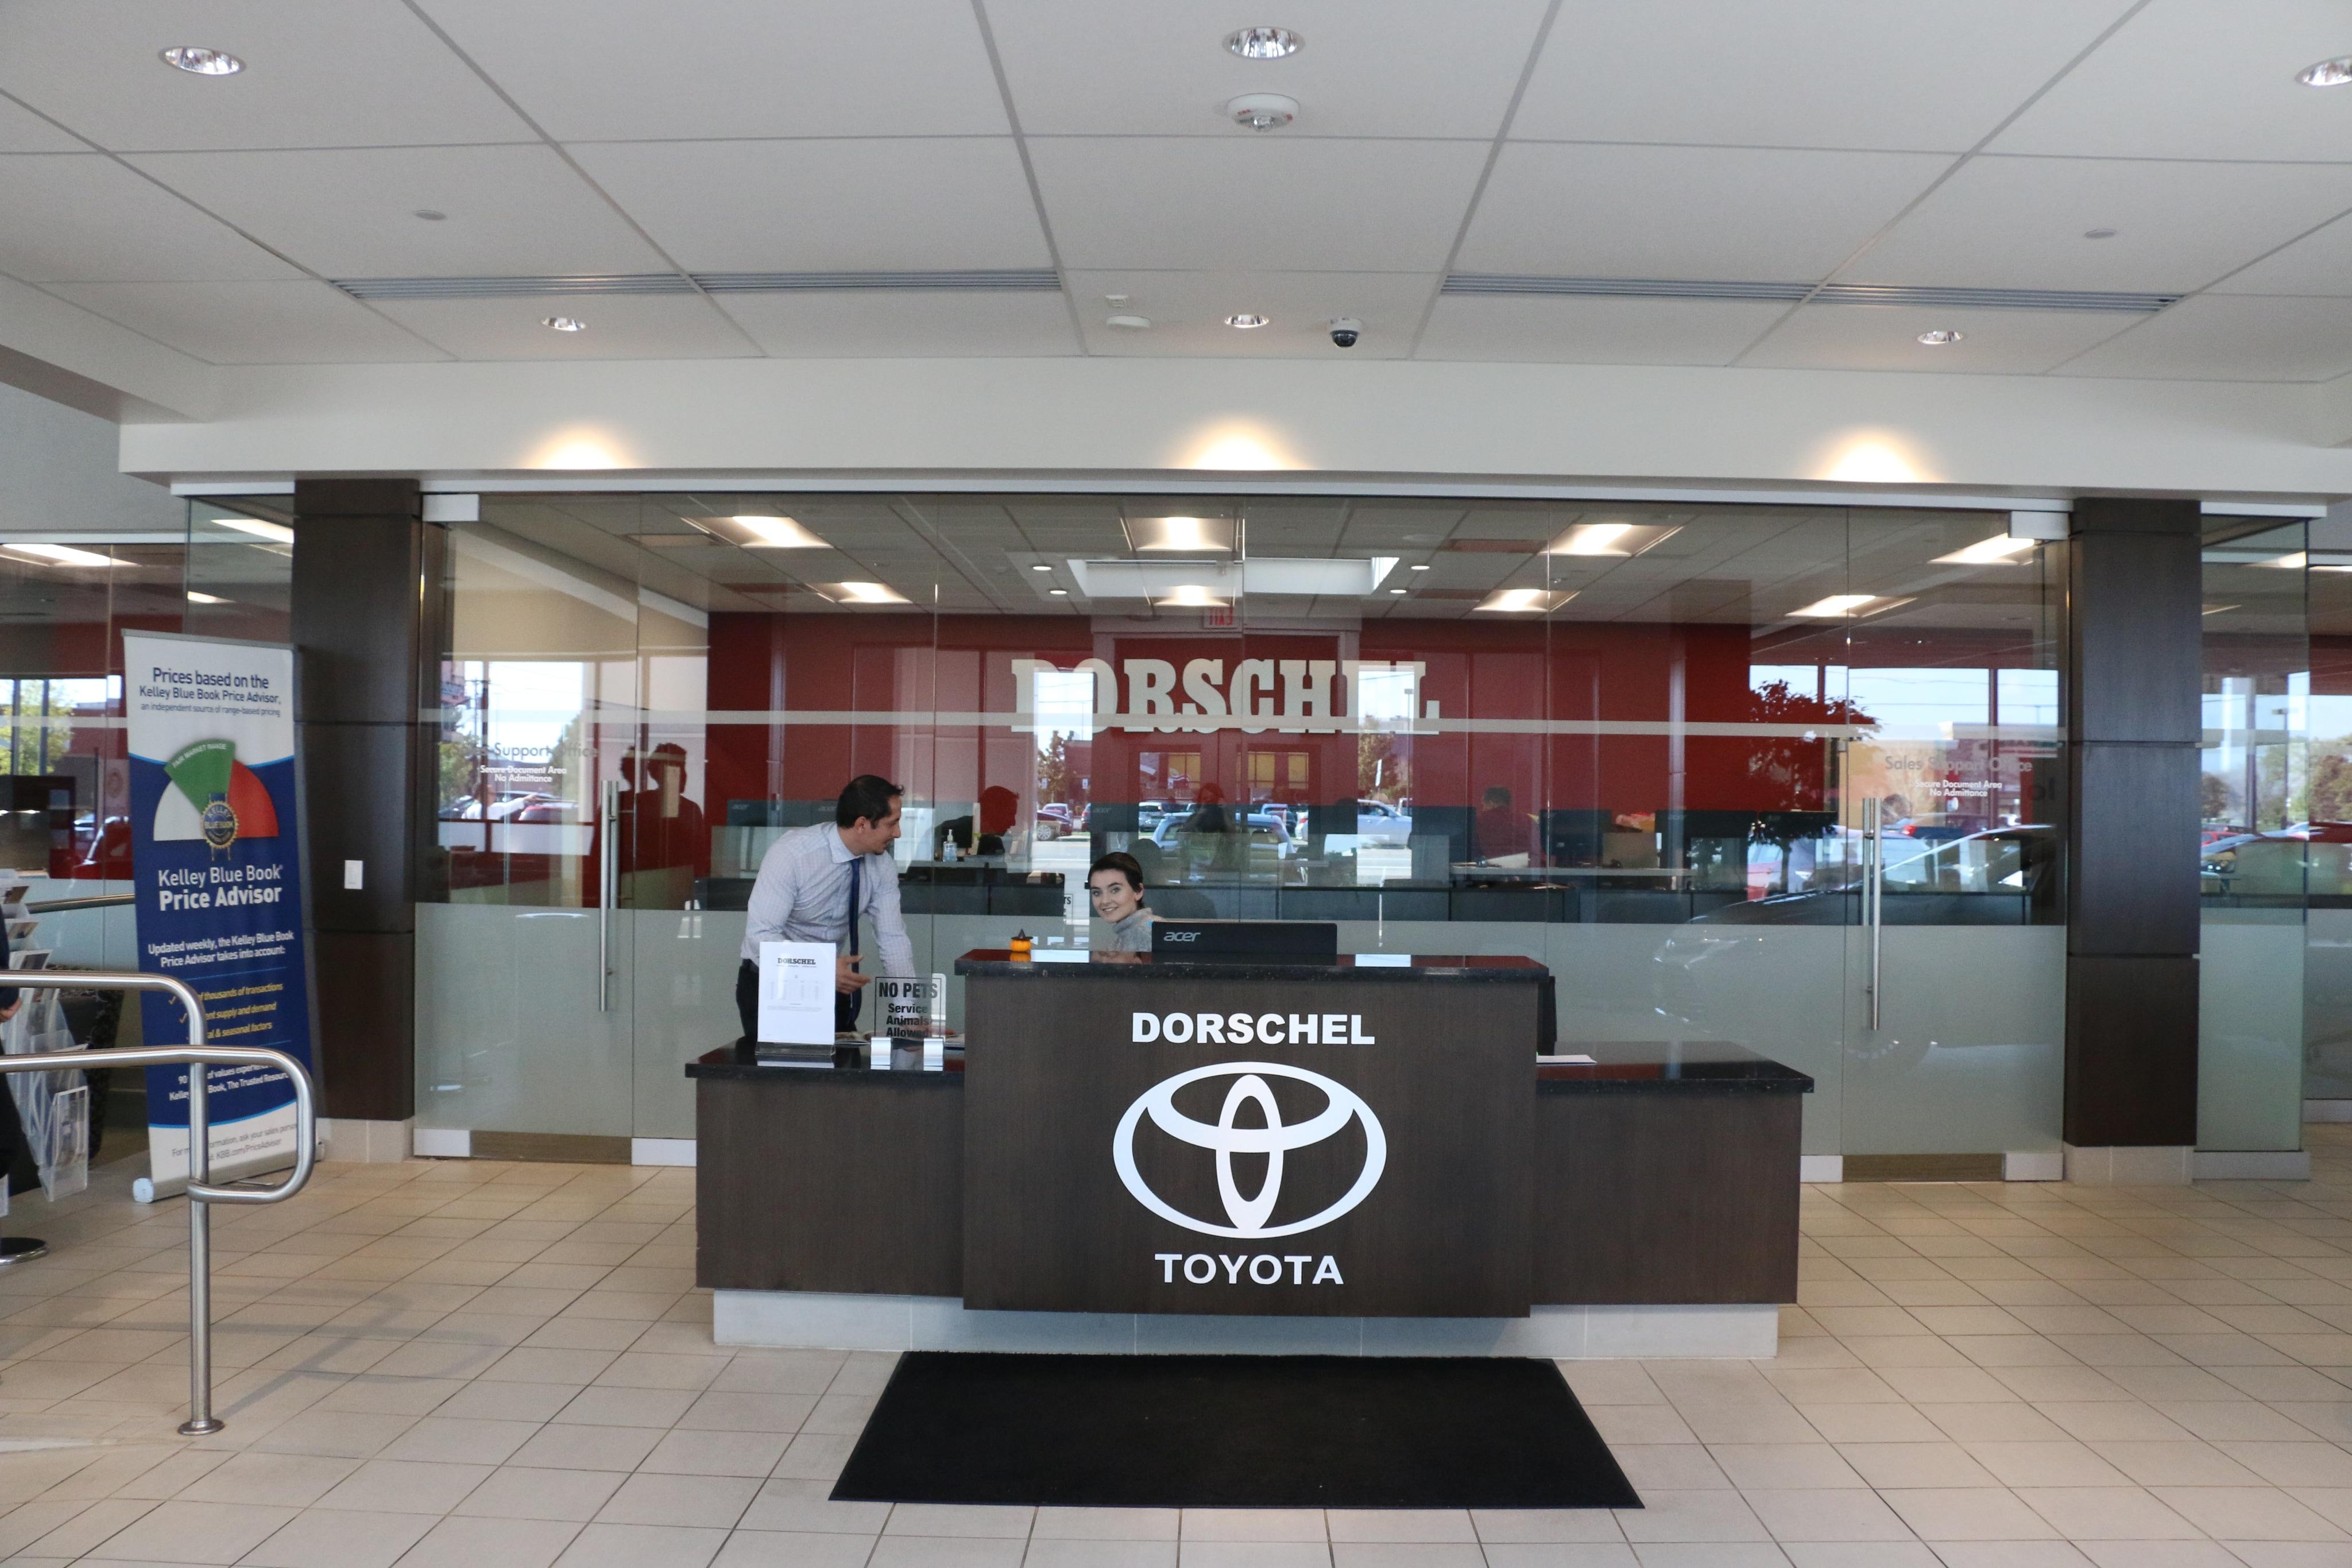 Toyota Dealers Rochester Ny >> Dorschel Toyota Rochester New York Toyota Dealership